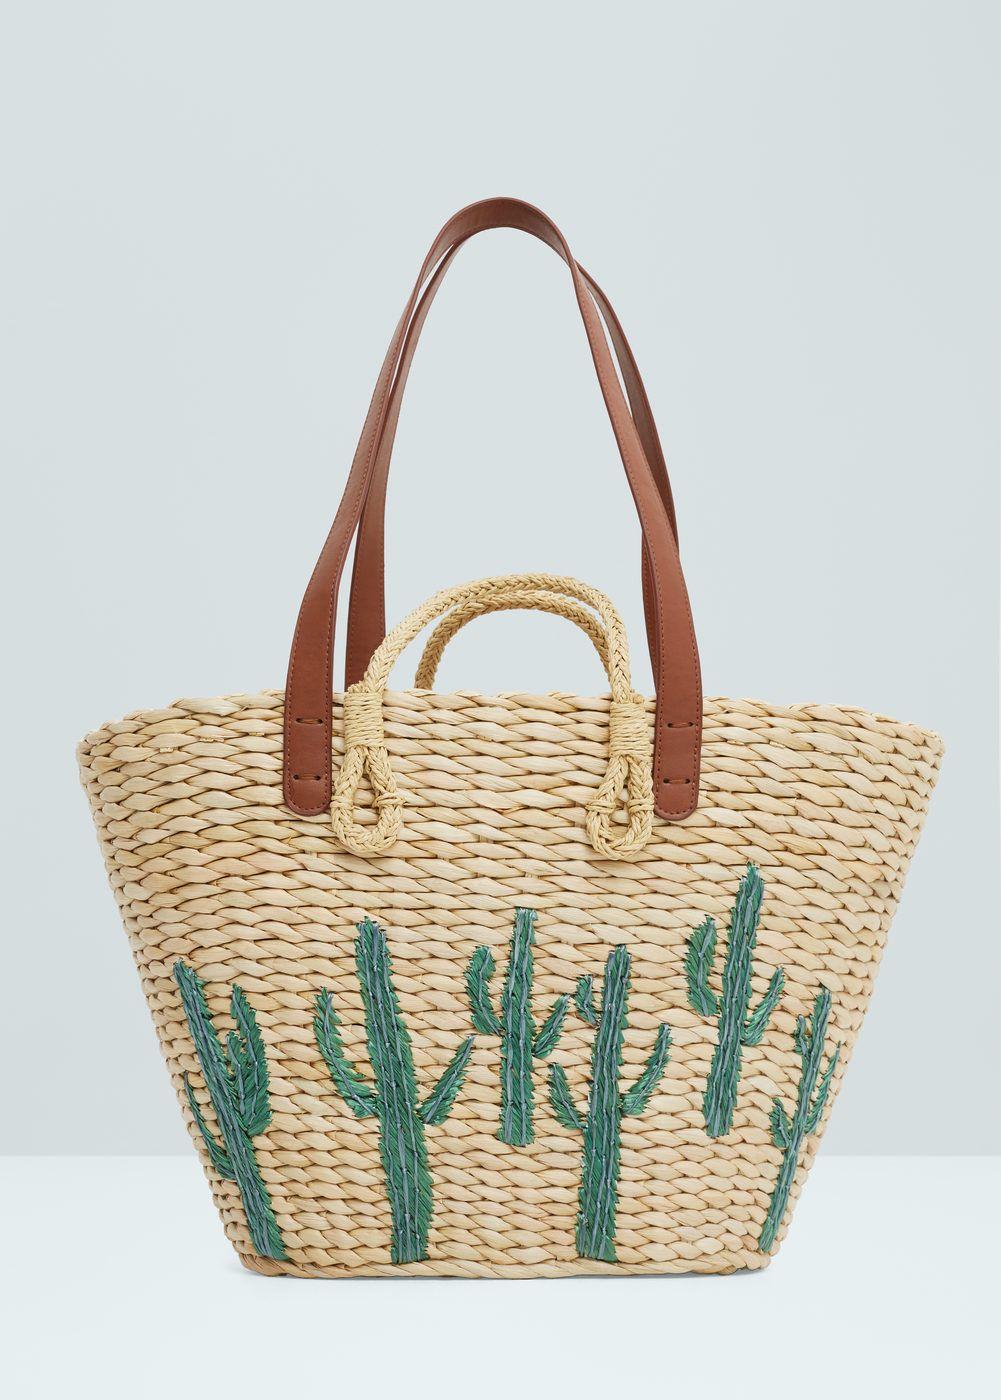 Sac paille | Straw bag and Bag